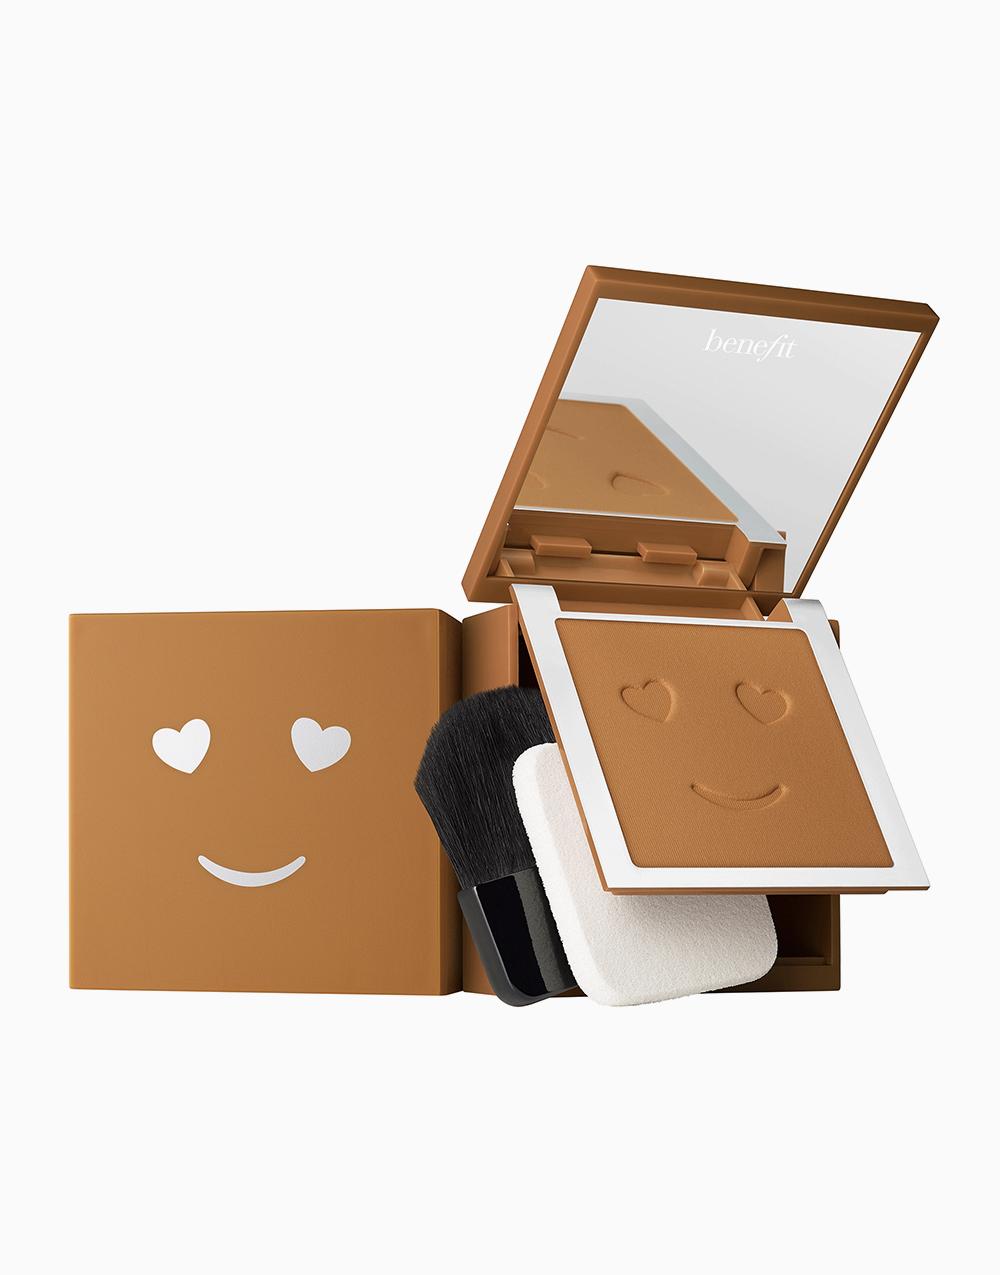 Hello Happy Velvet Powder Foundation by Benefit | Shade 09